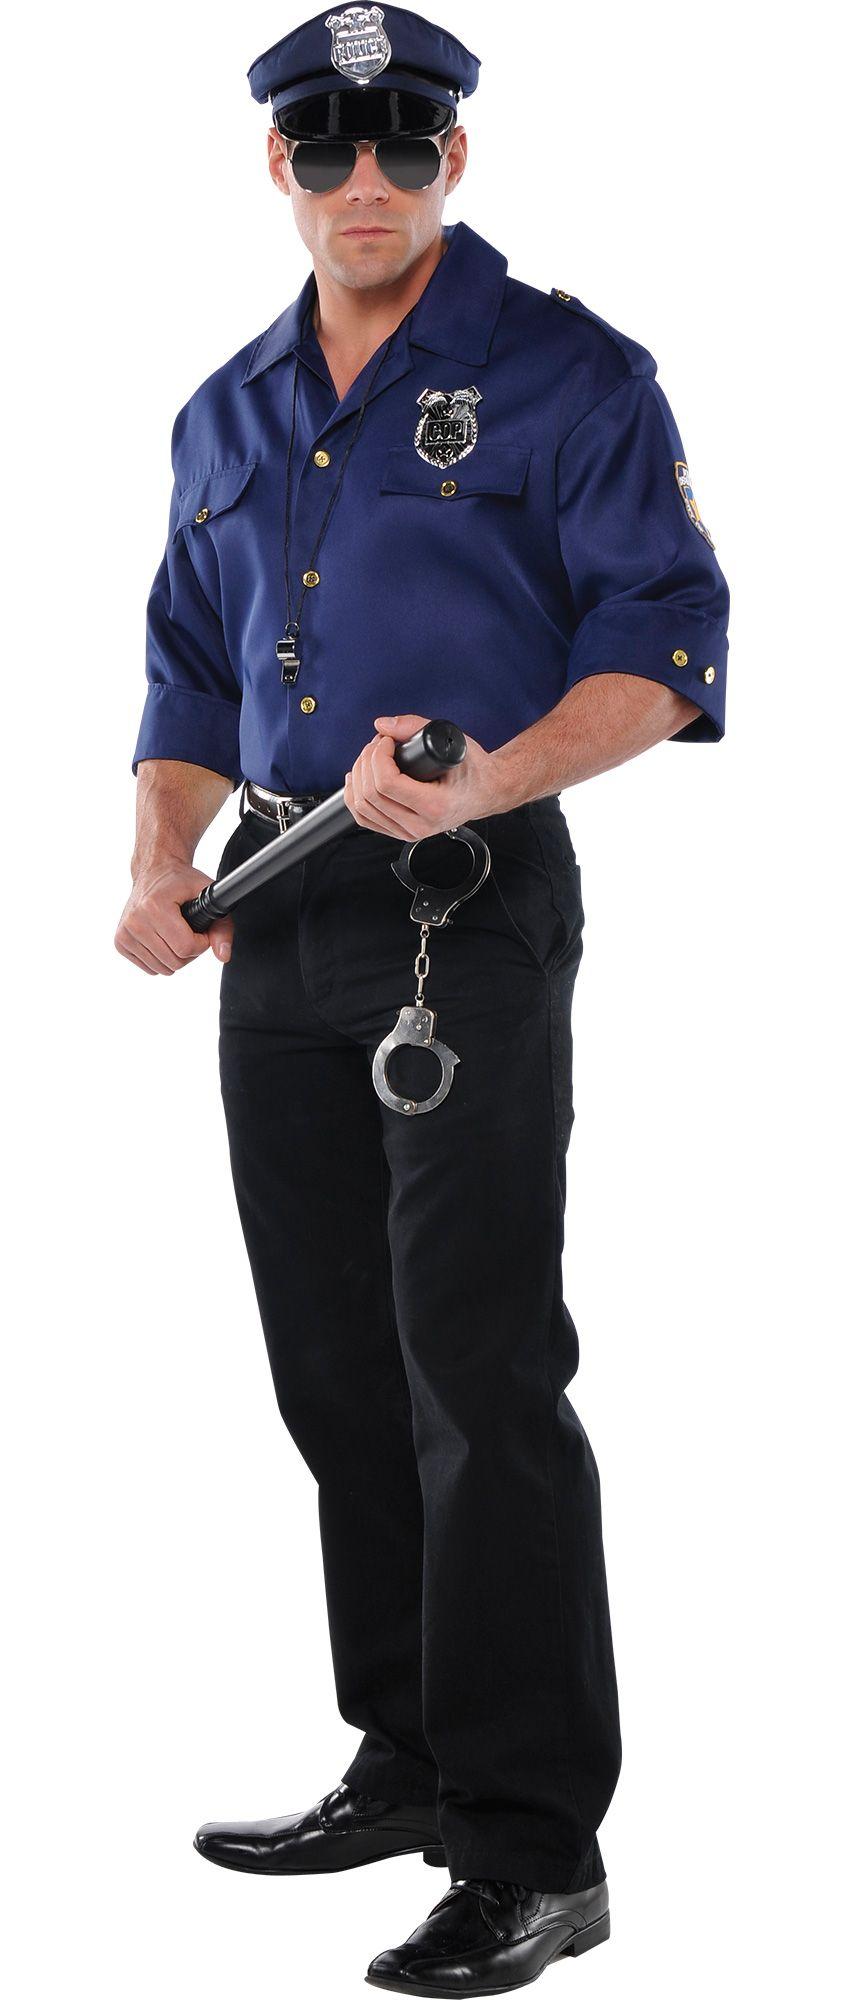 Men's Cop Costume Accessories